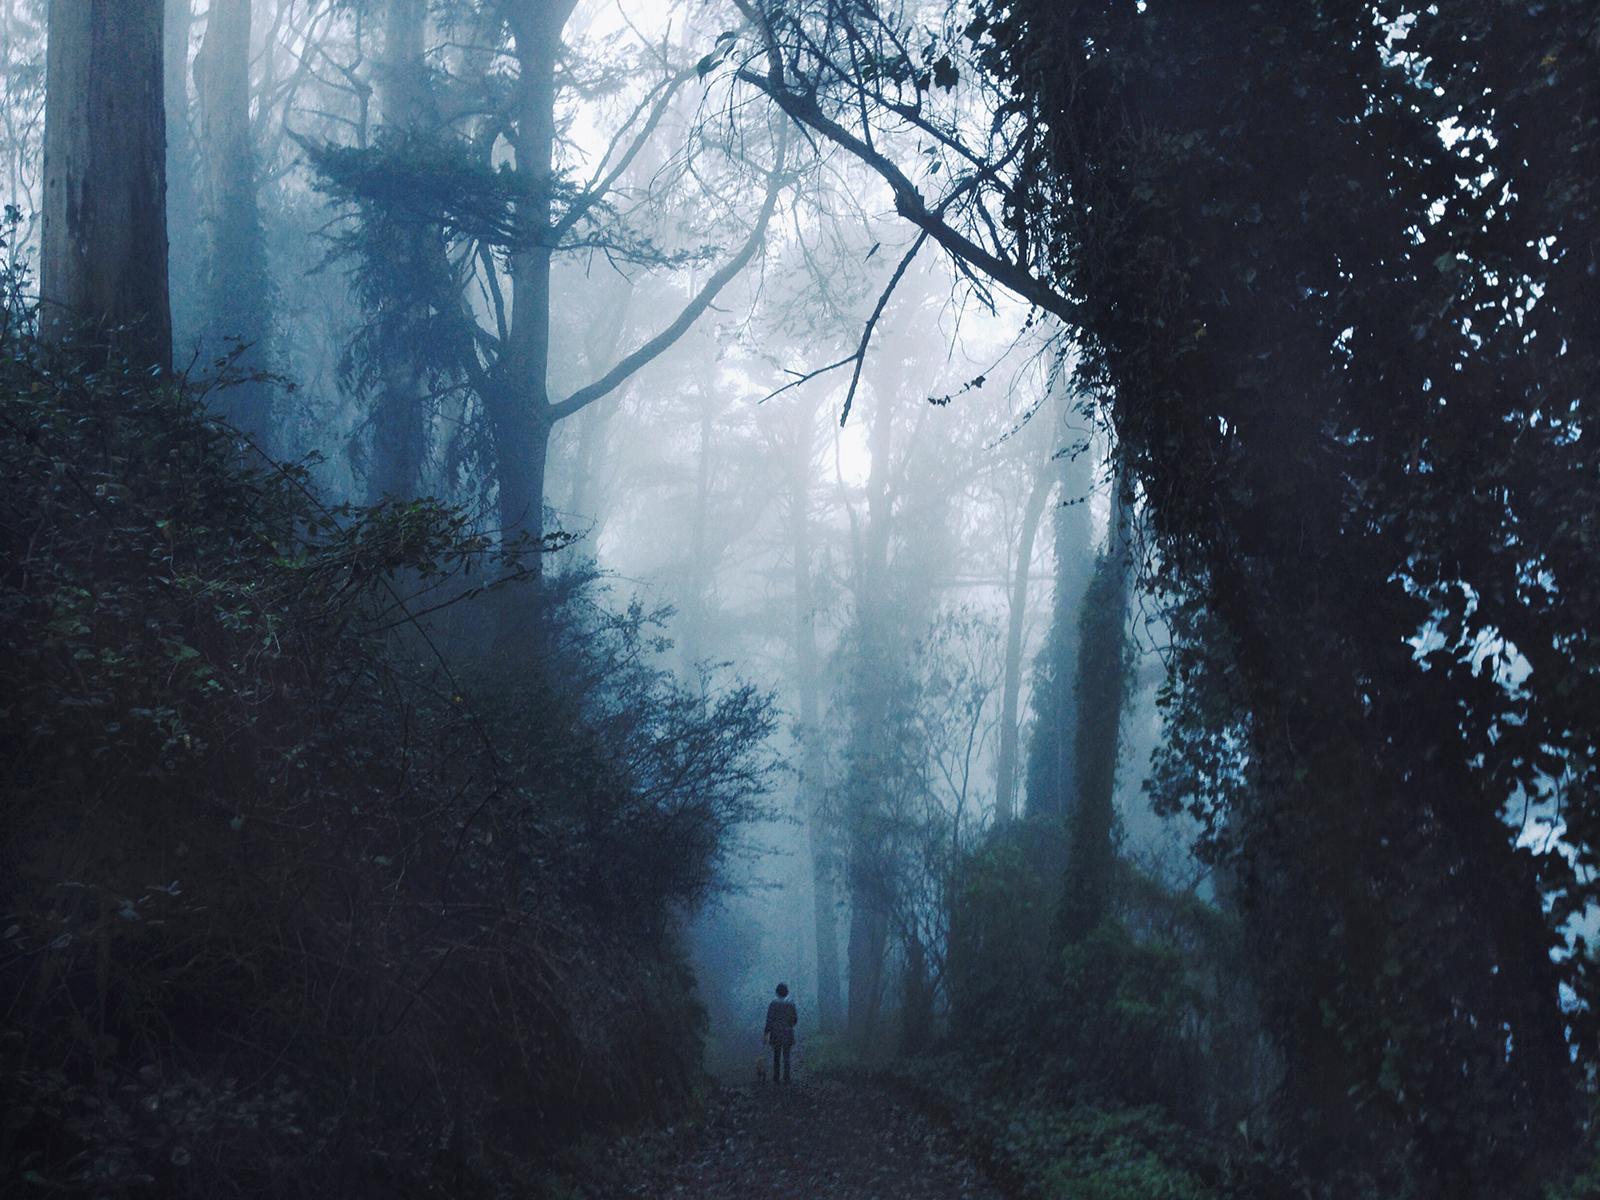 san francisco fog iPhone photography.jpg